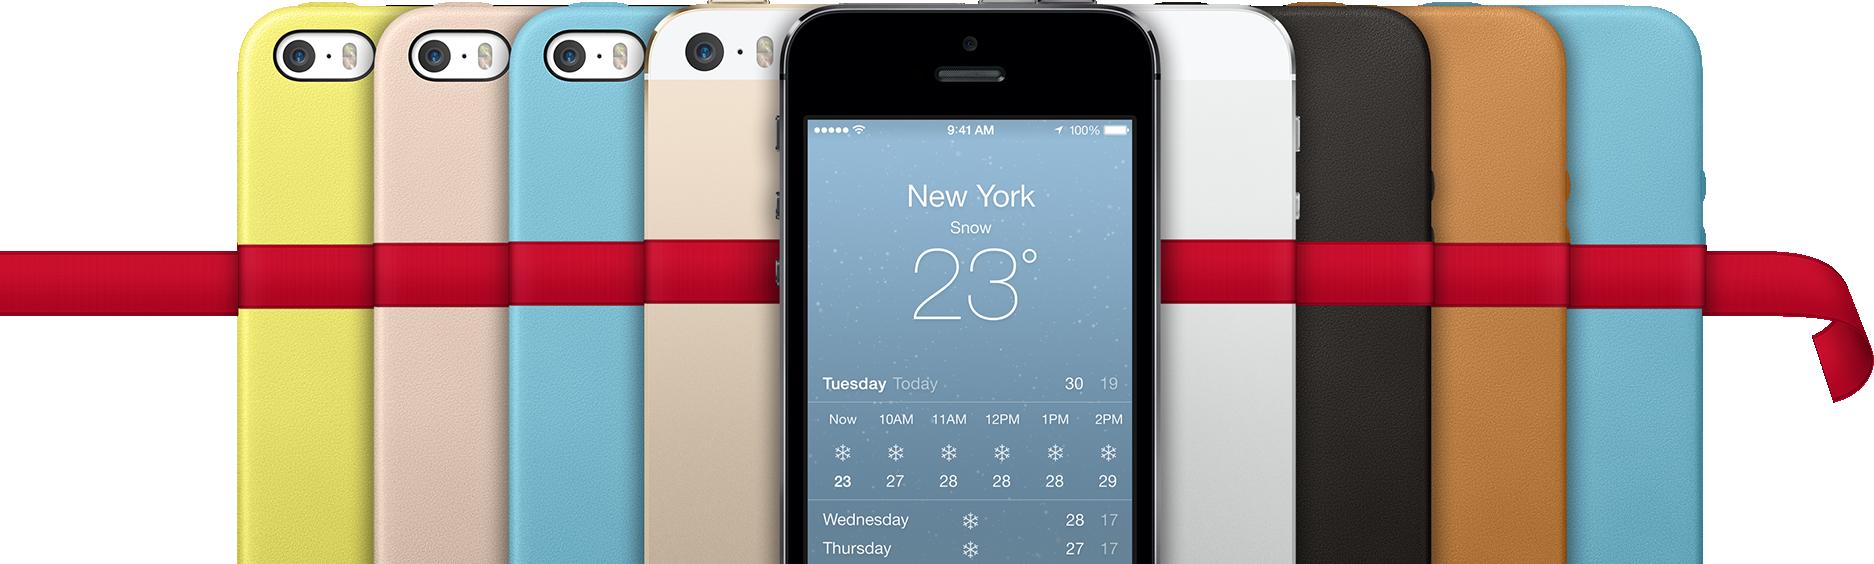 iPhone 5s - Natal